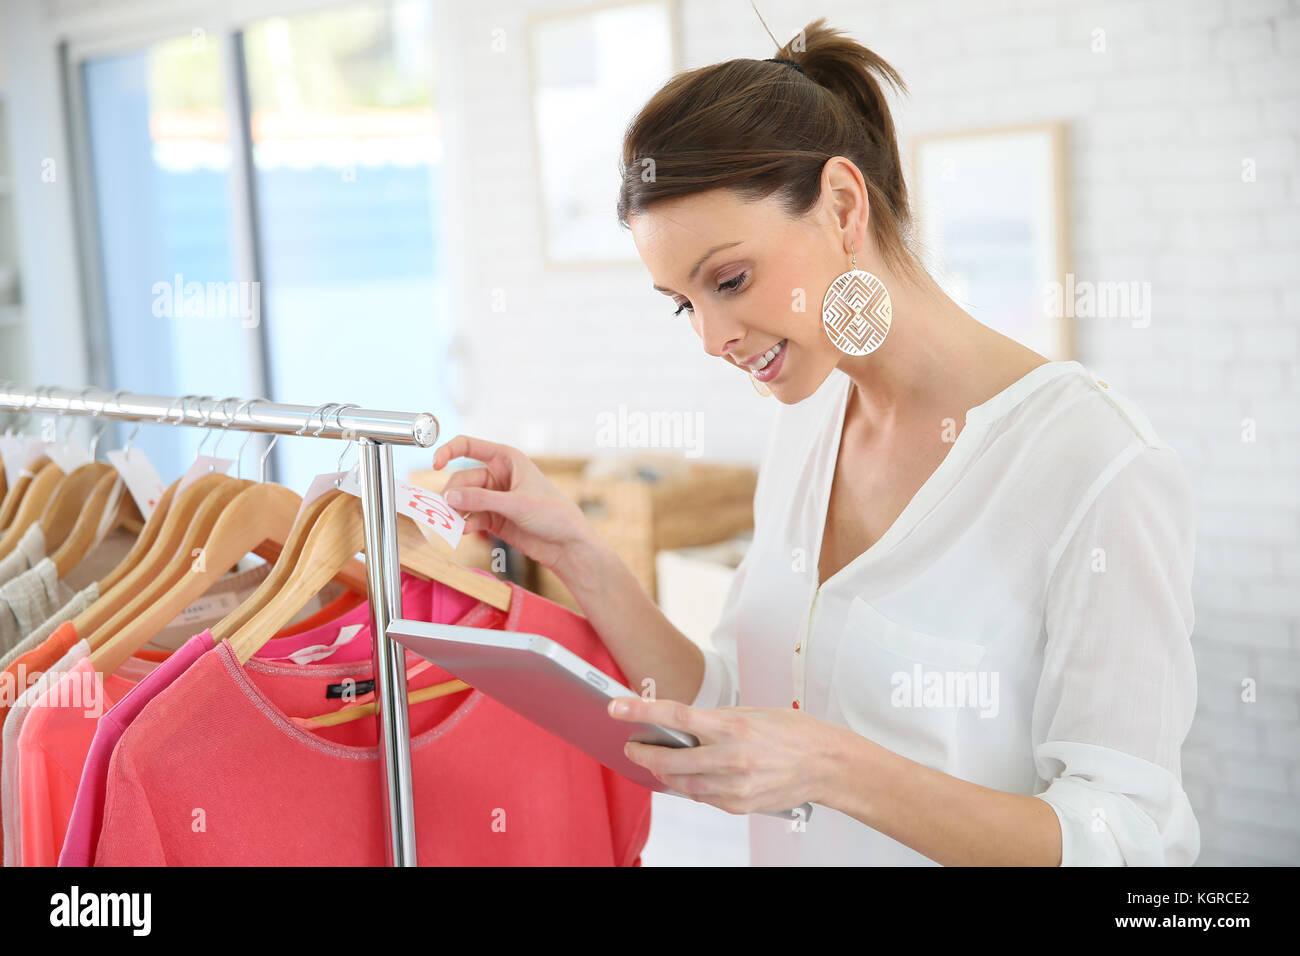 Shop woman preparing summer sales in store - Stock Image